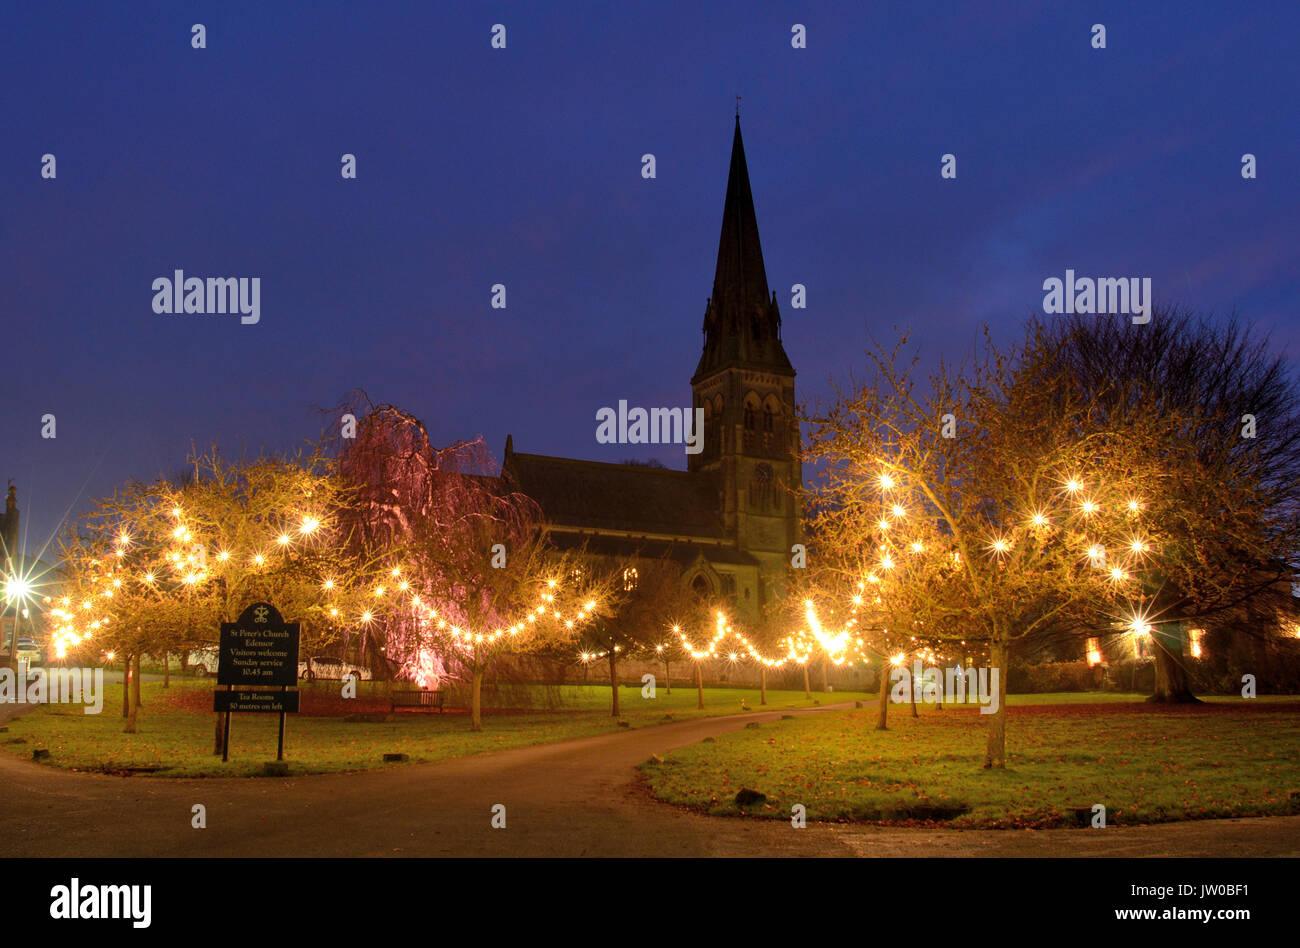 Christmas Lights On Stone Wall : Peak District Winter Stock Photos & Peak District Winter Stock Images - Alamy